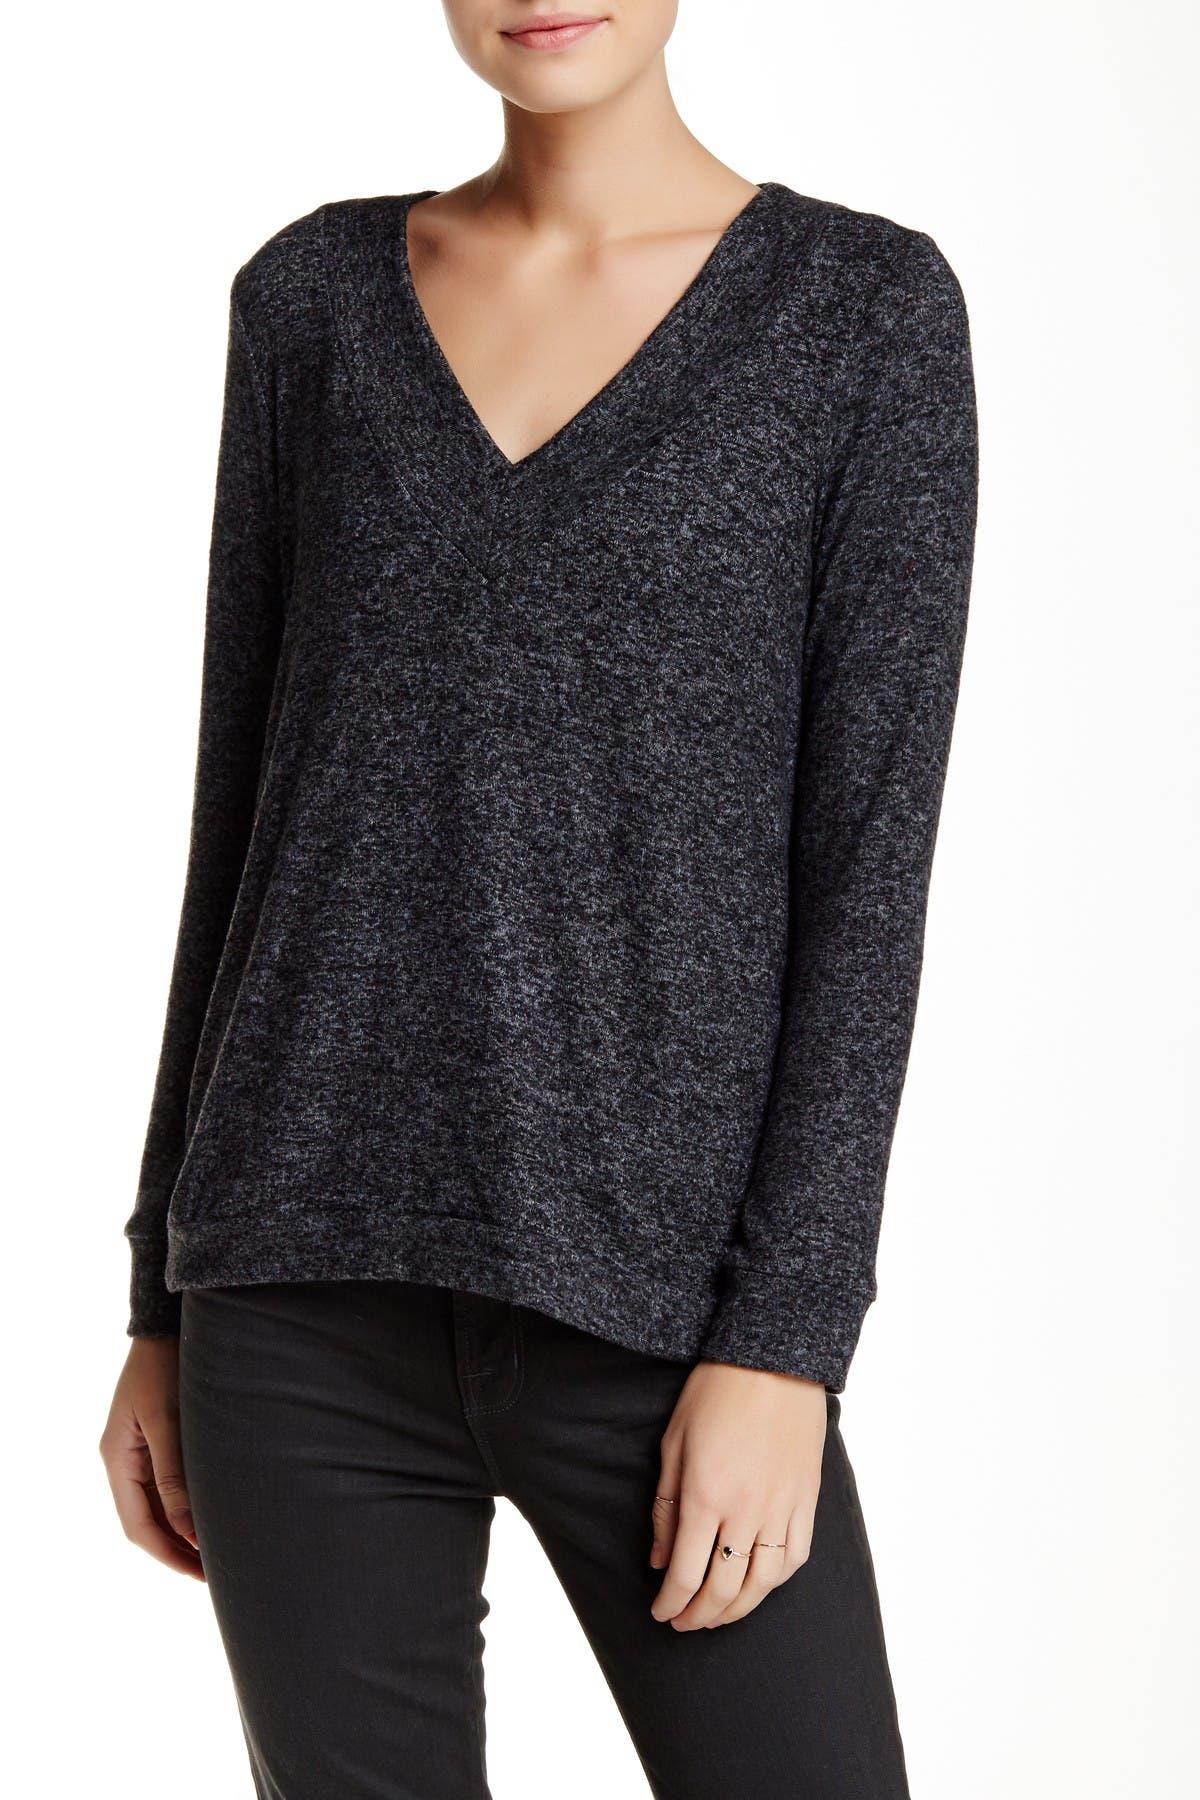 Image of Harlowe & Graham V-Neck Soft Knit Fleece Sweater